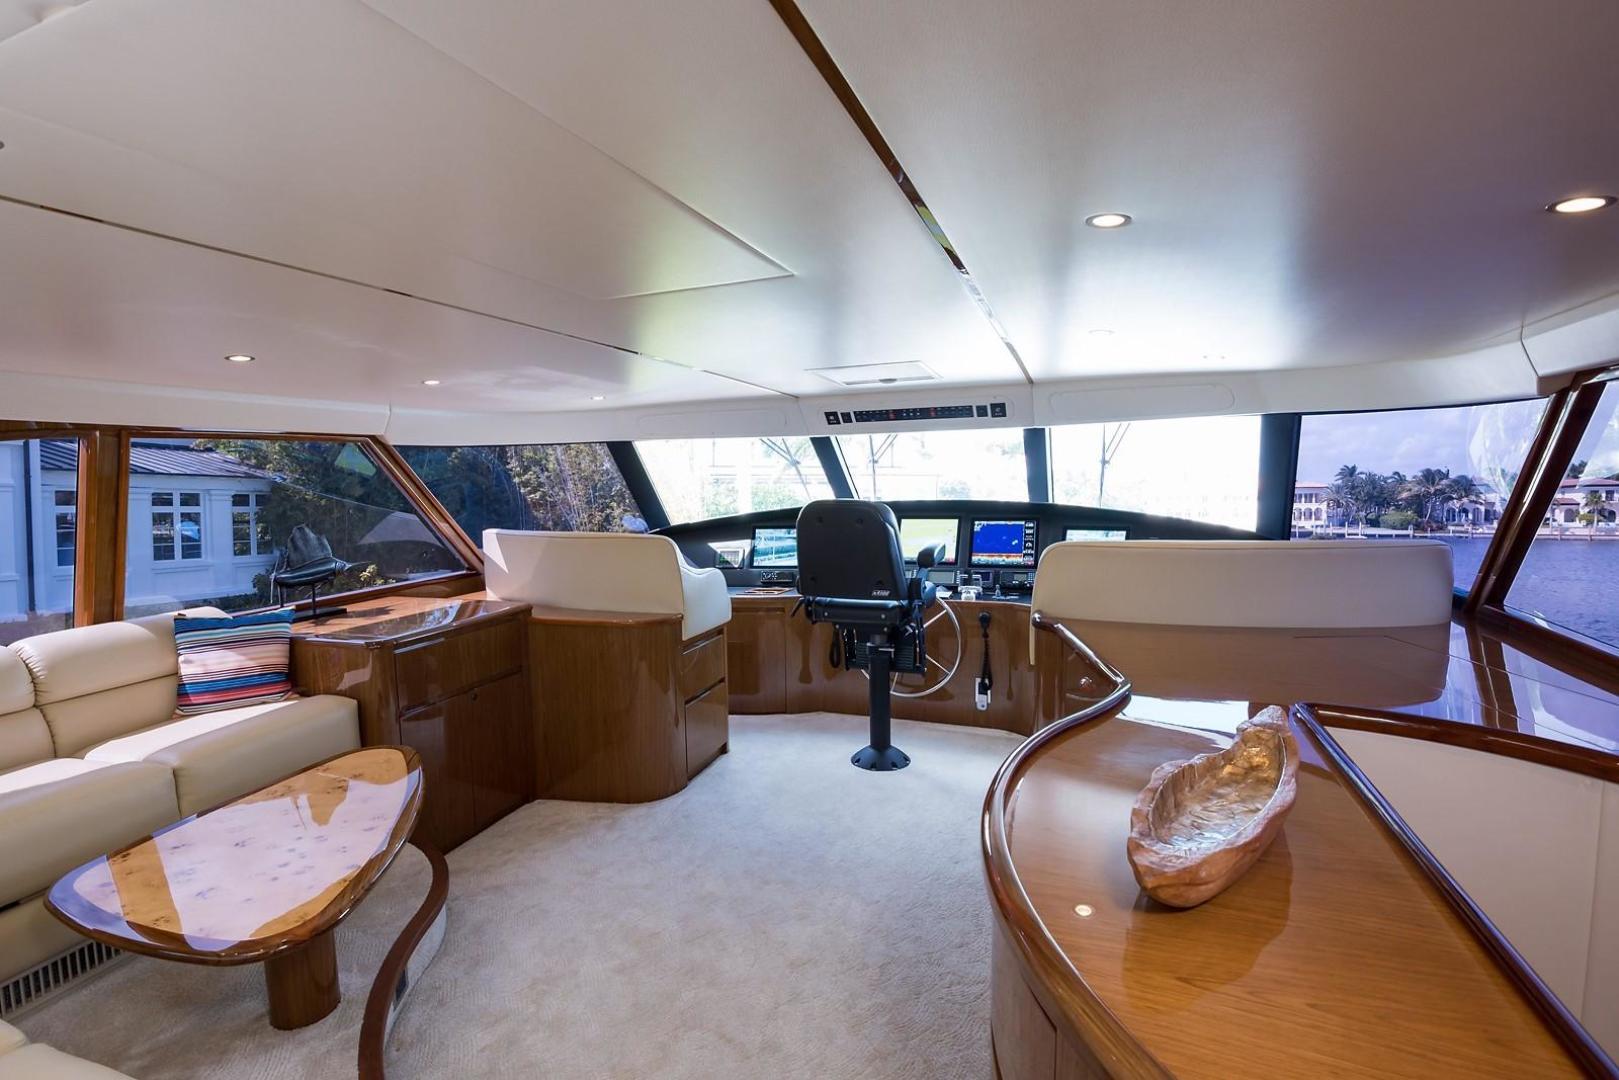 Viking-Enclosed 2013-No Name 82 Miami-Florida-United States-Enclosed Flybridge-1324711 | Thumbnail